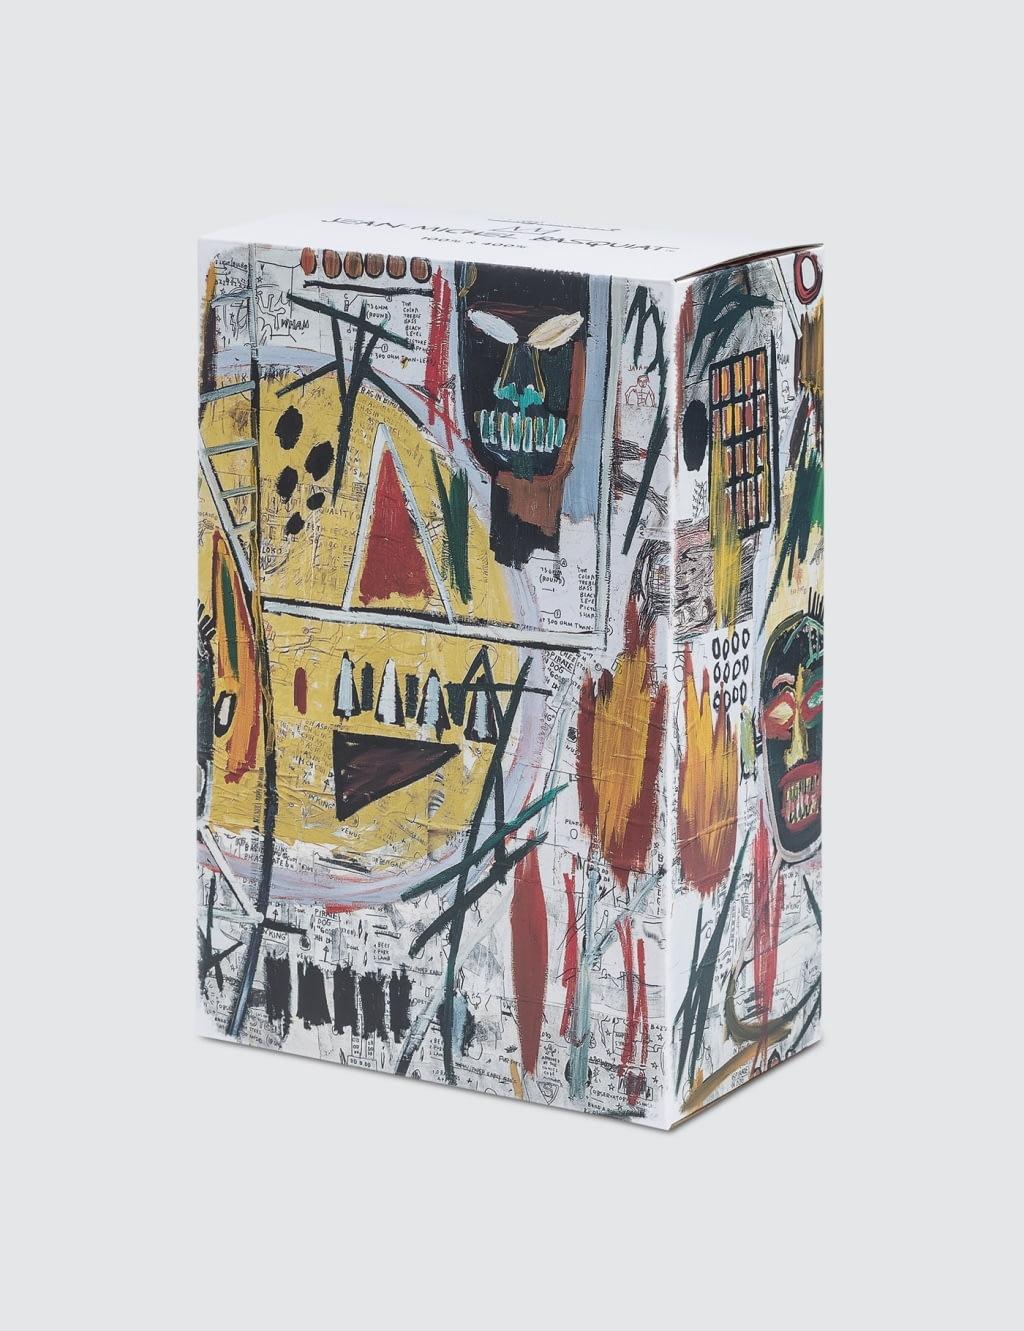 Medicom Toy 100 400 Jean Michel Basquiat Berbrick